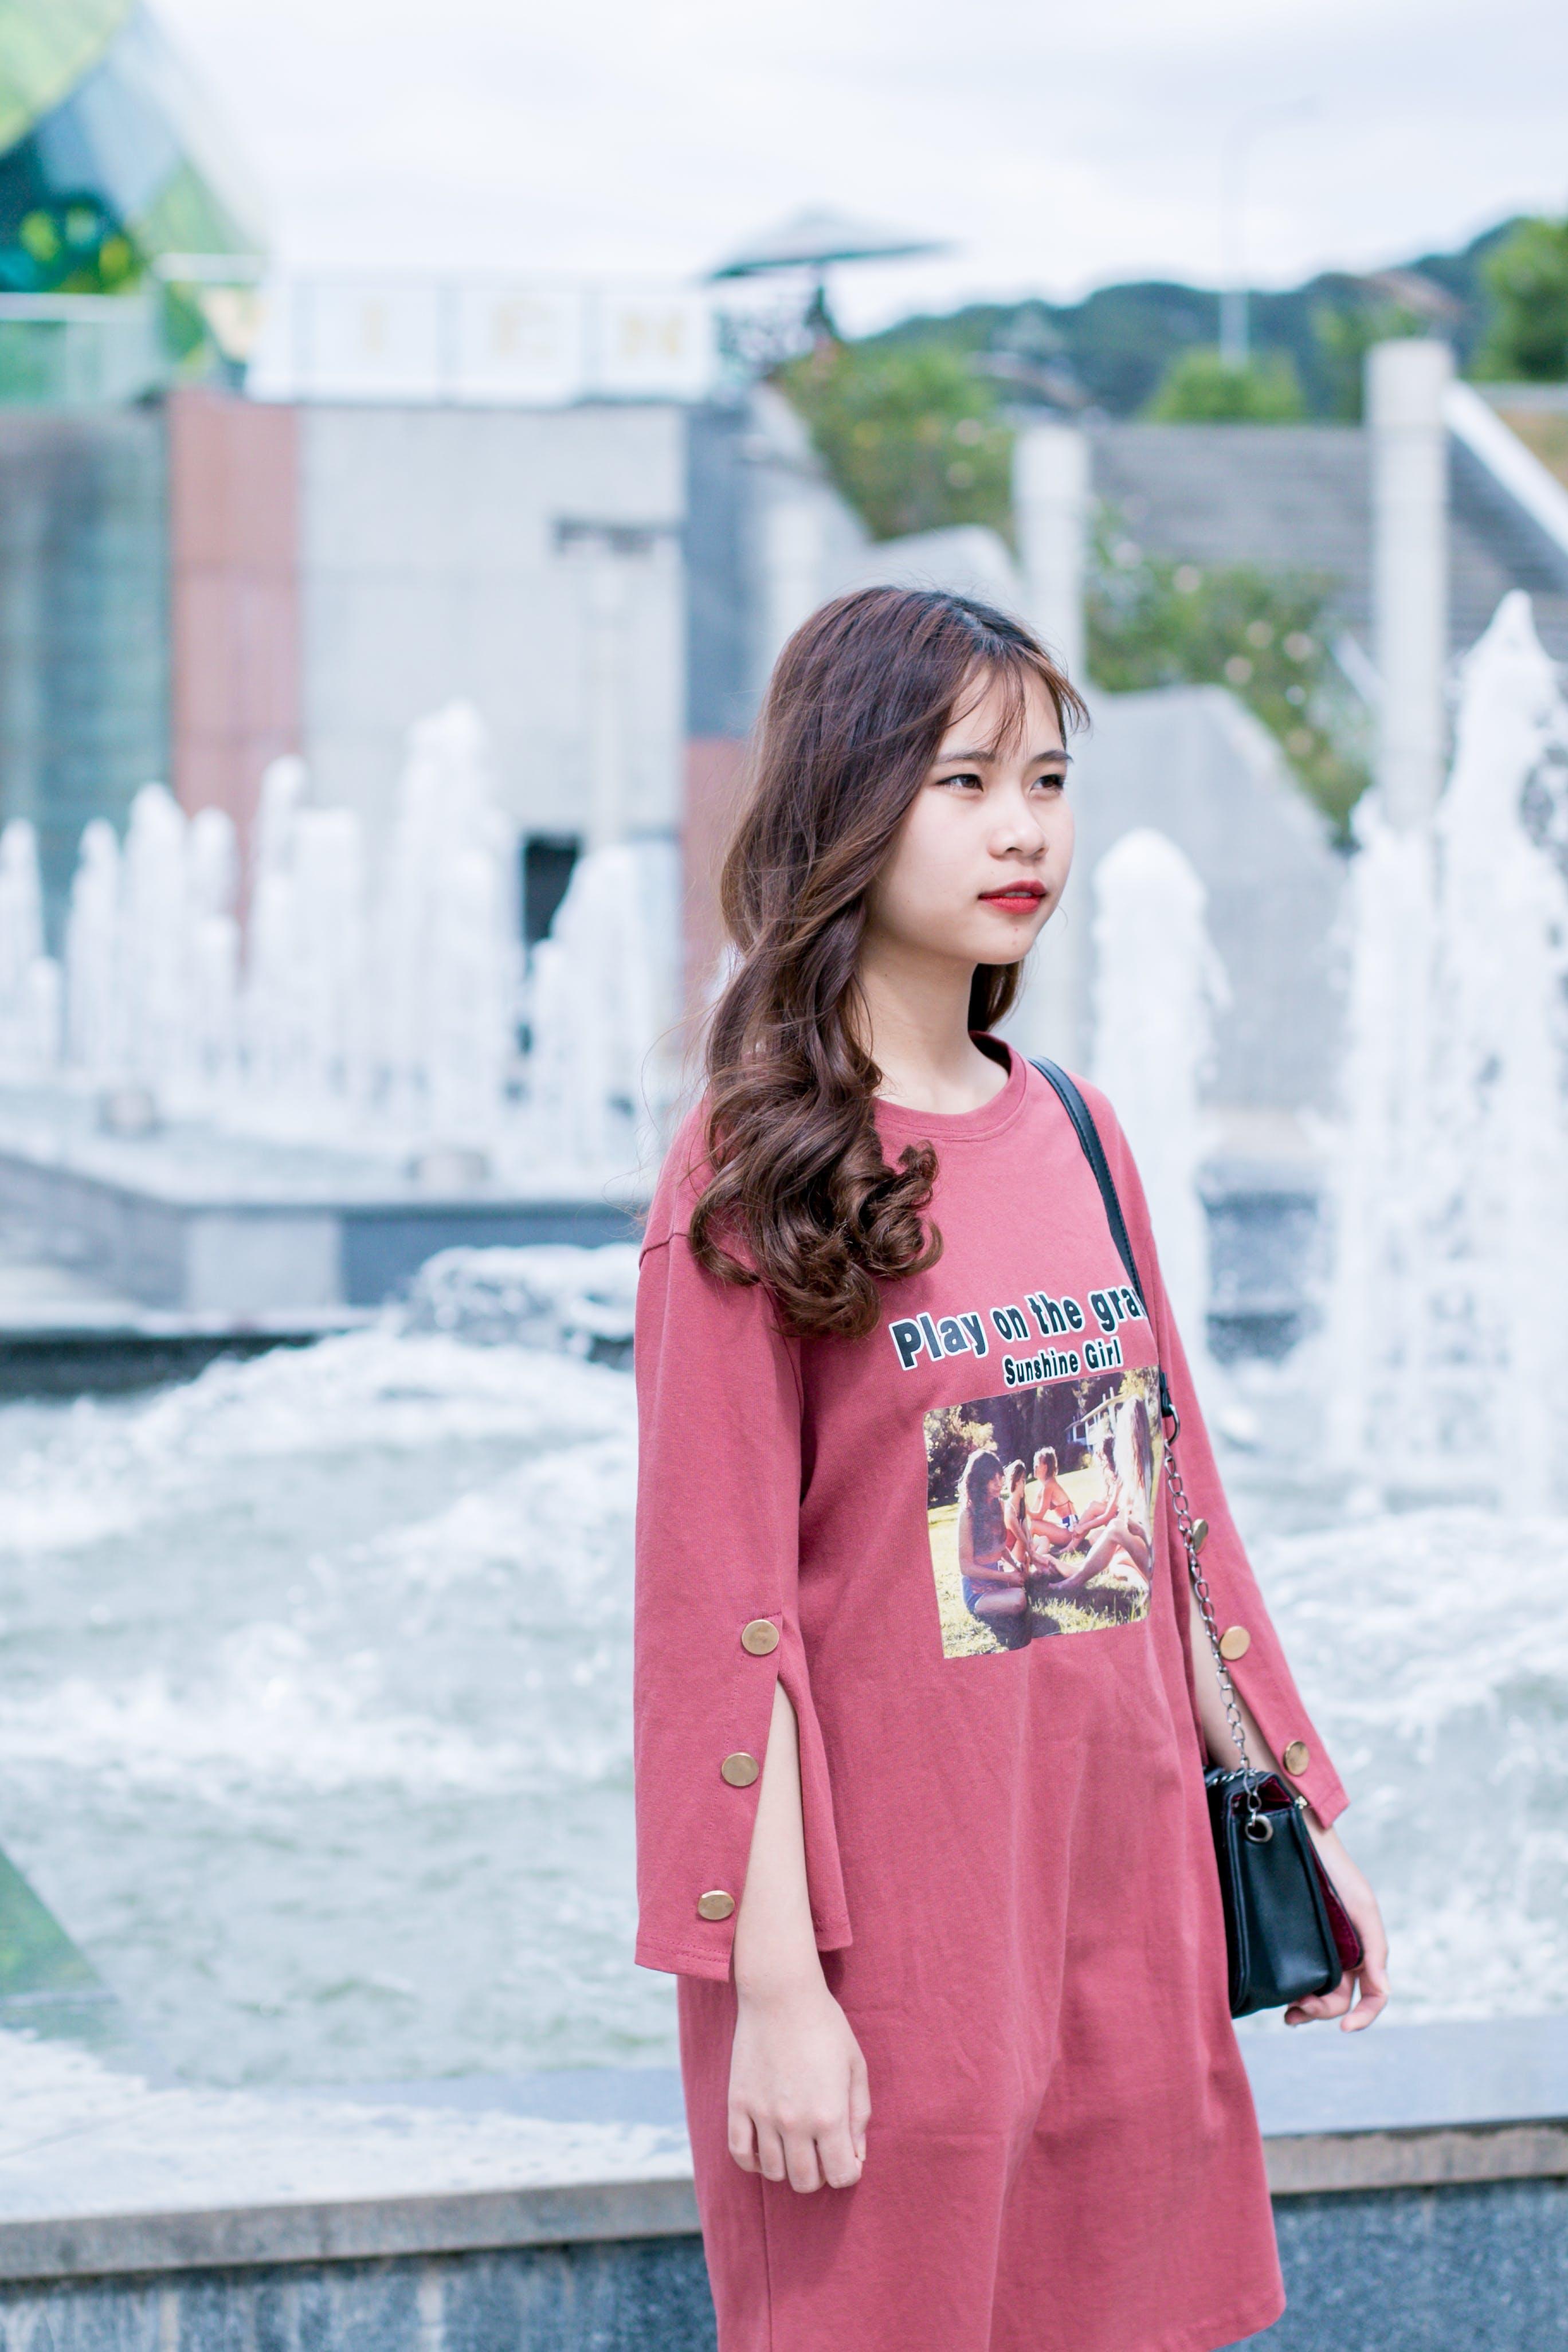 Woman Wearing Red Dress Near Fountain